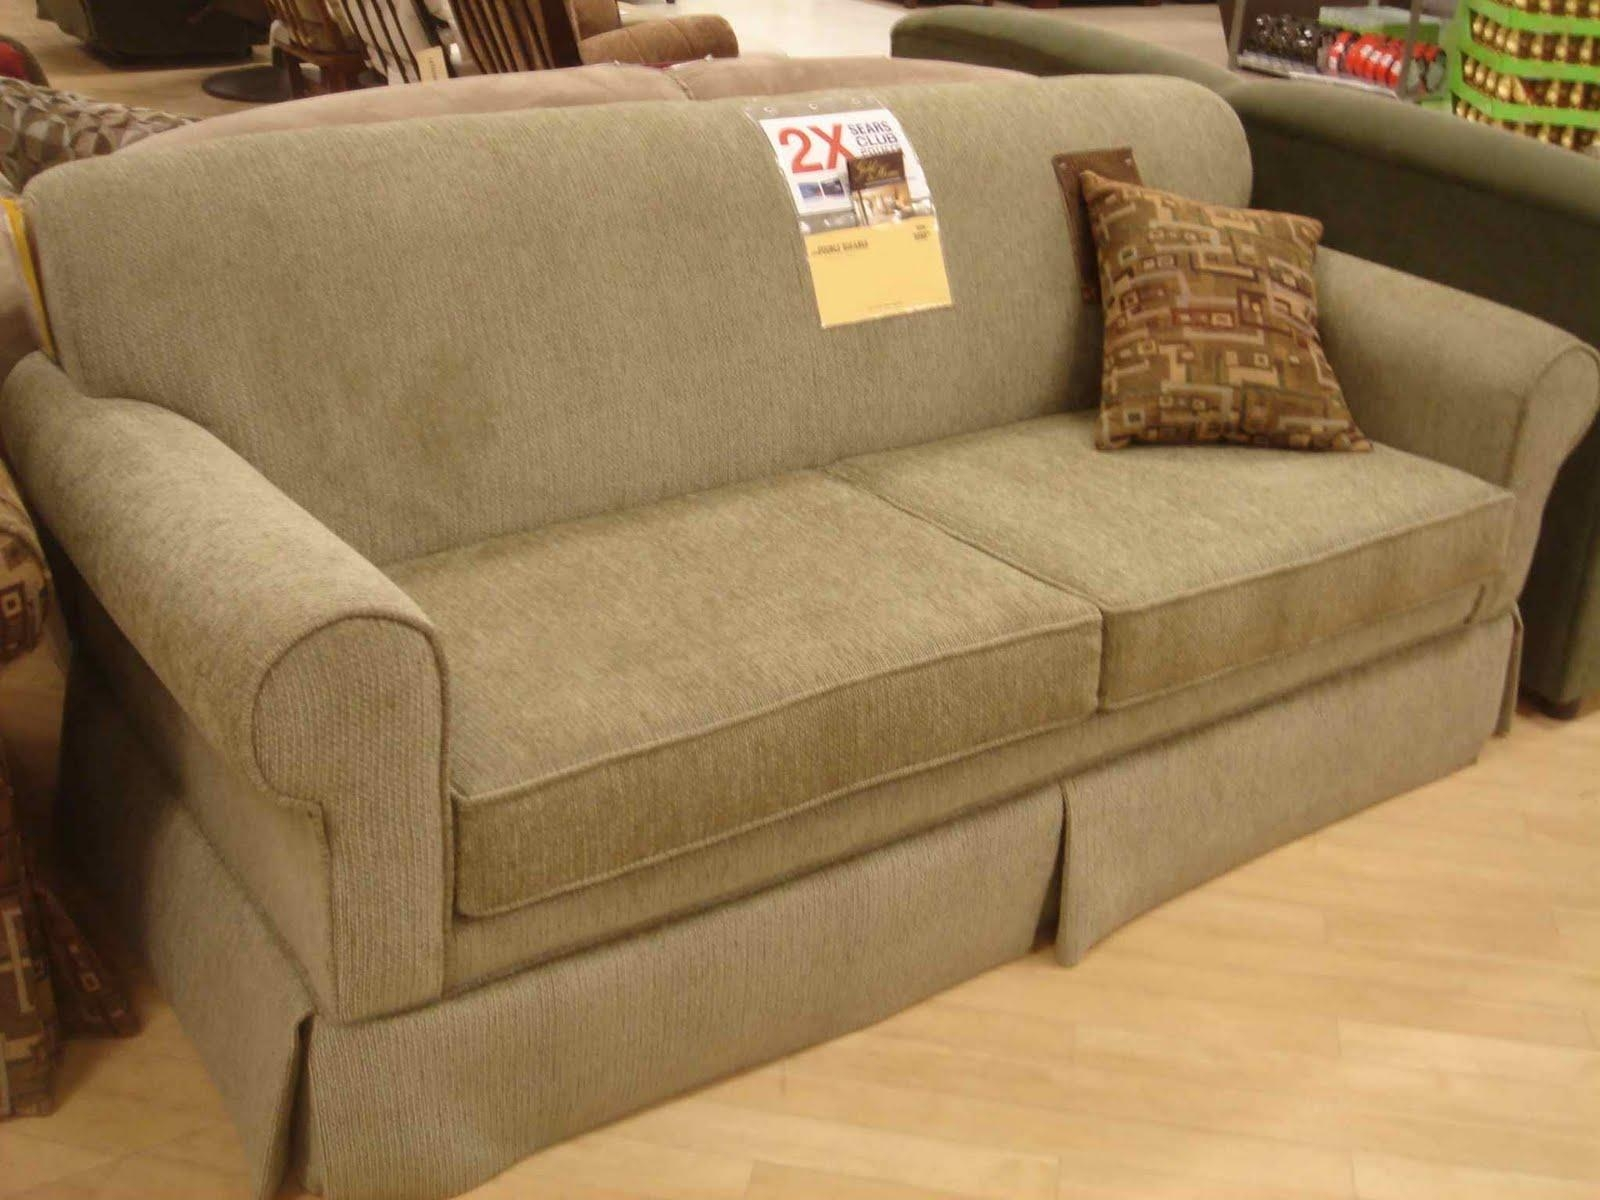 Loveseat Sleeper Sofa Sears | Tehranmix Decoration With Regard To Sears Sofa (View 13 of 20)